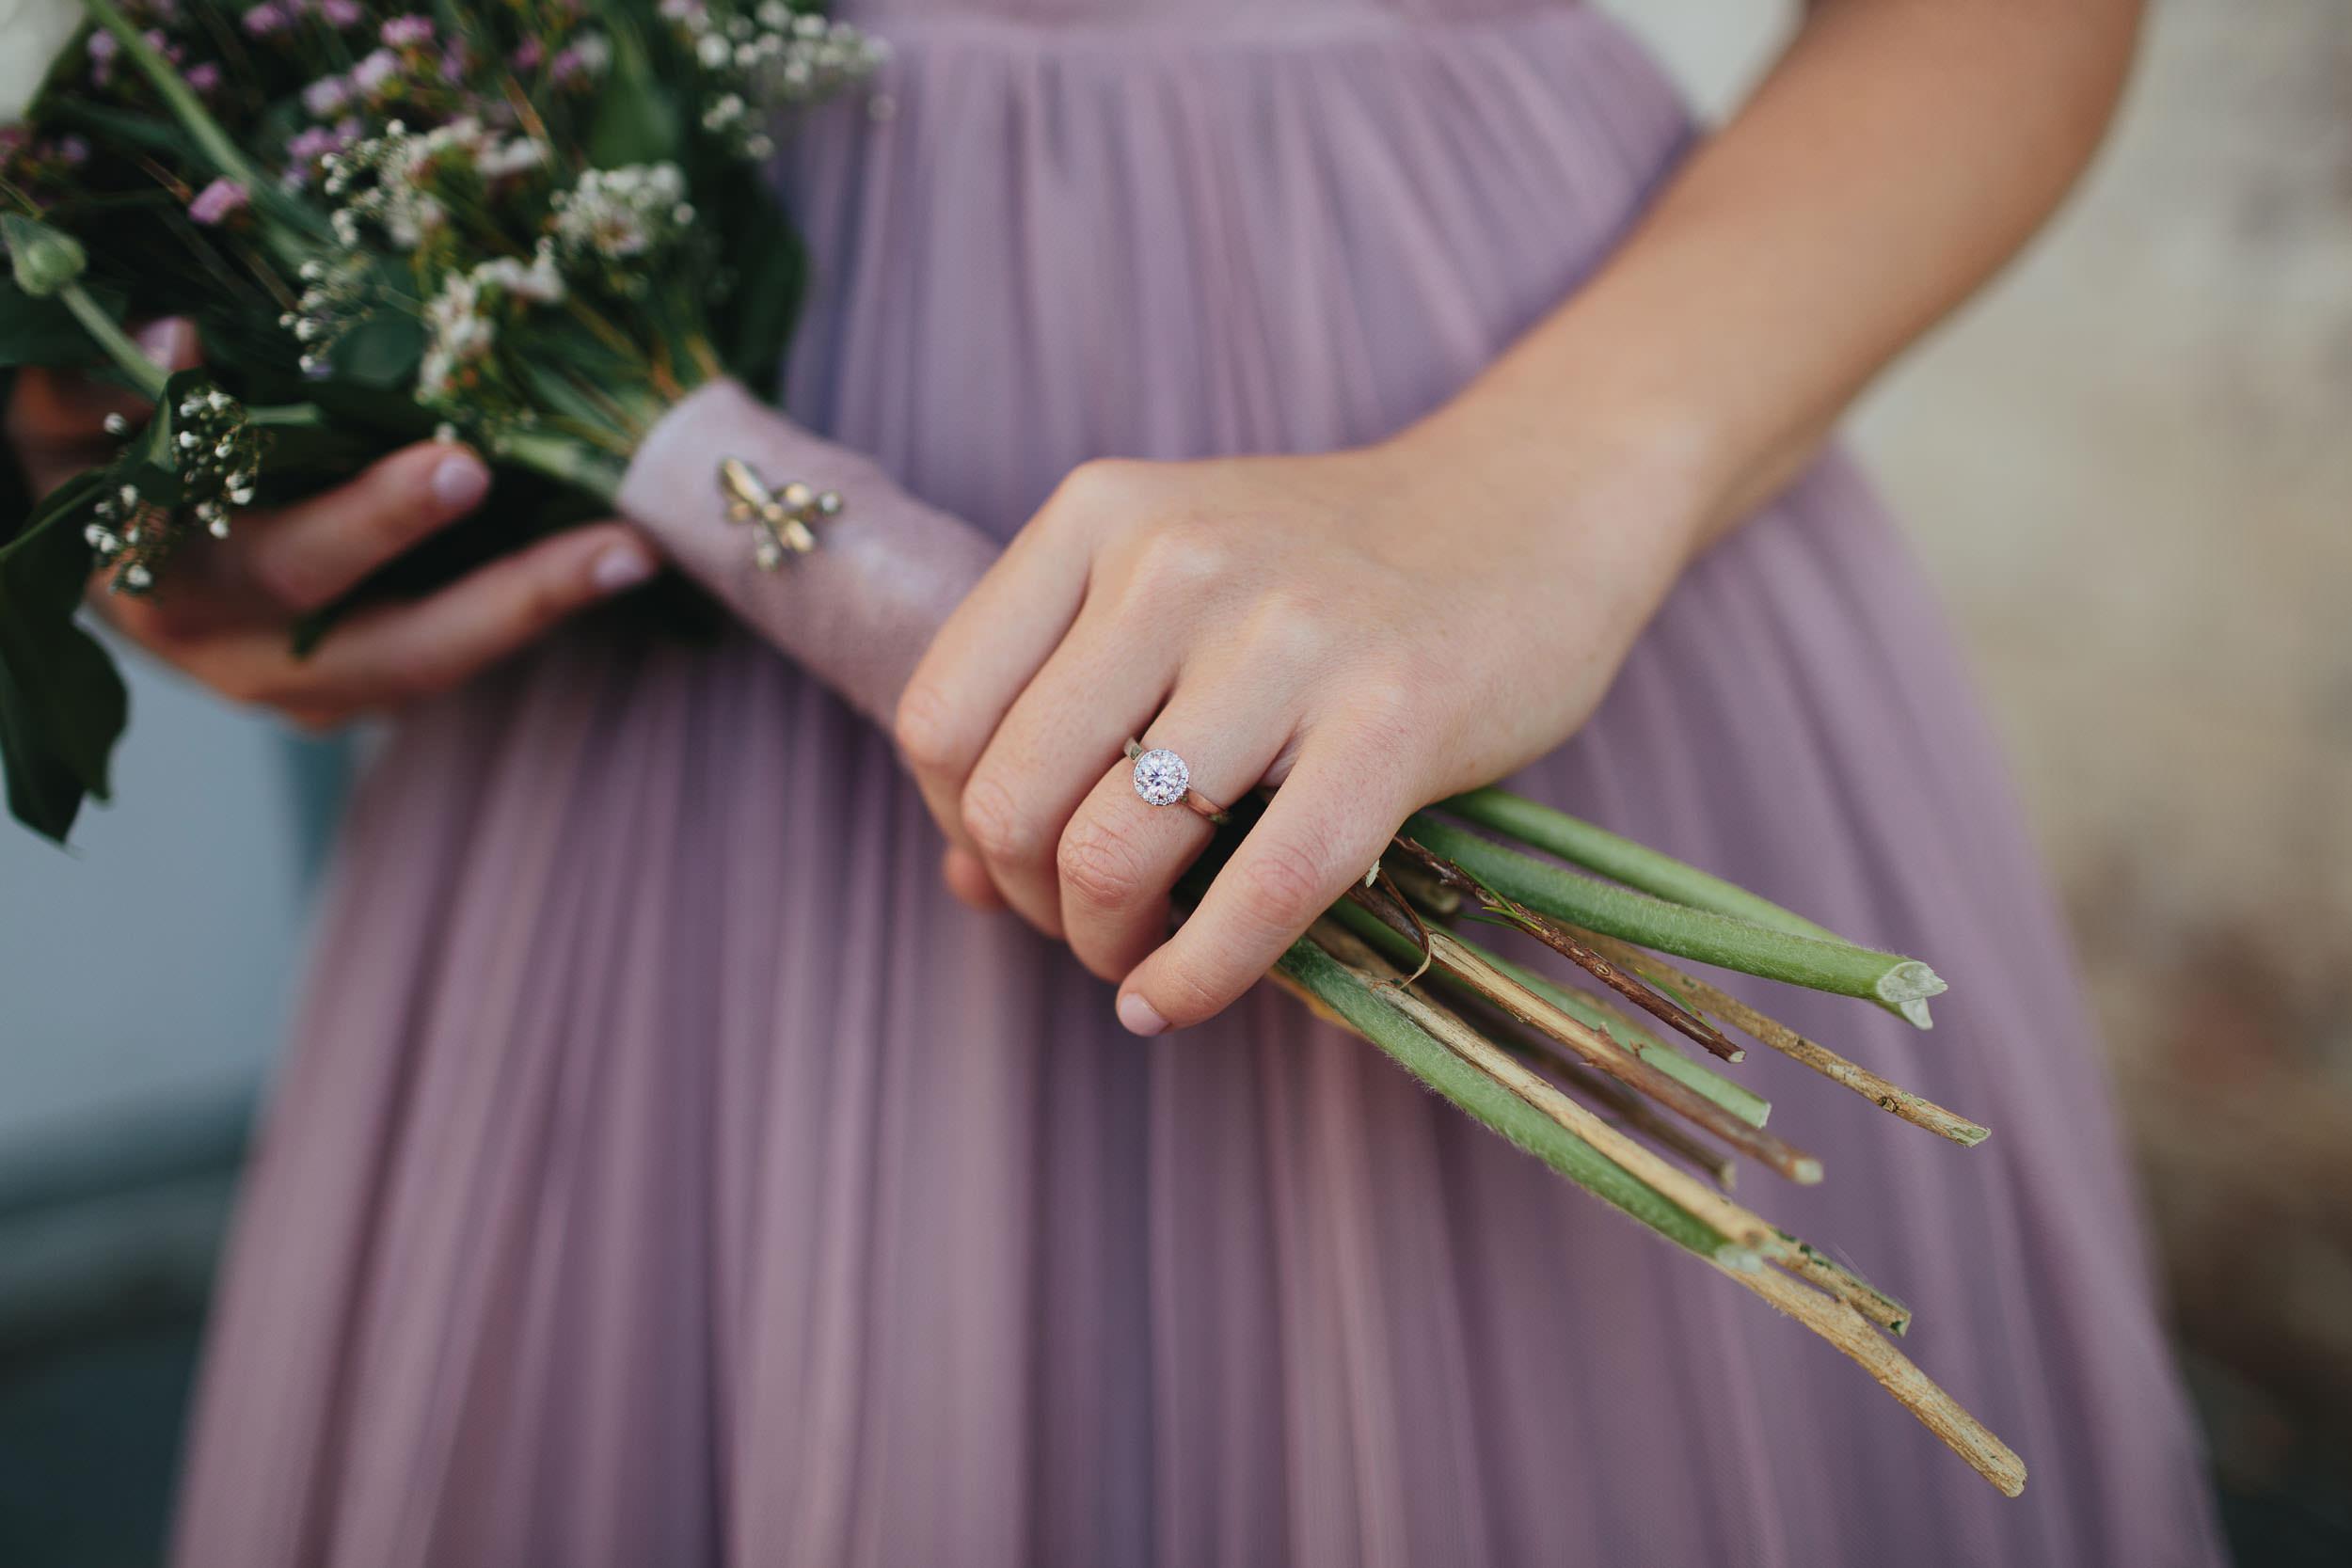 058_power_house_wedding_finch_and_oak.jpg